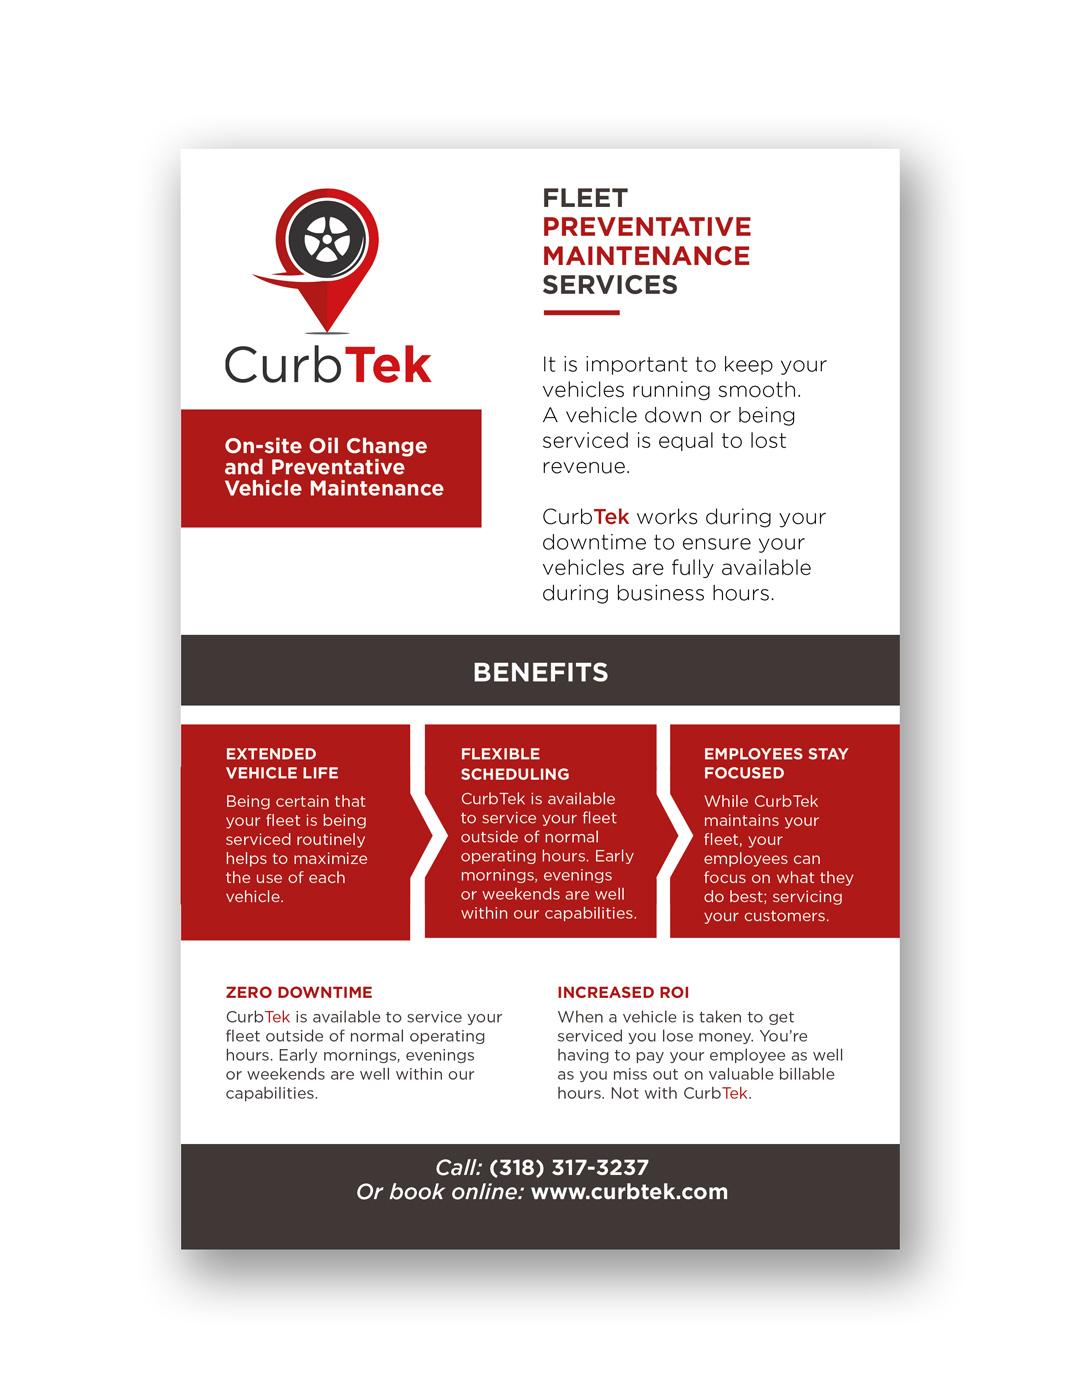 Curbtek-Flyer-2.jpg